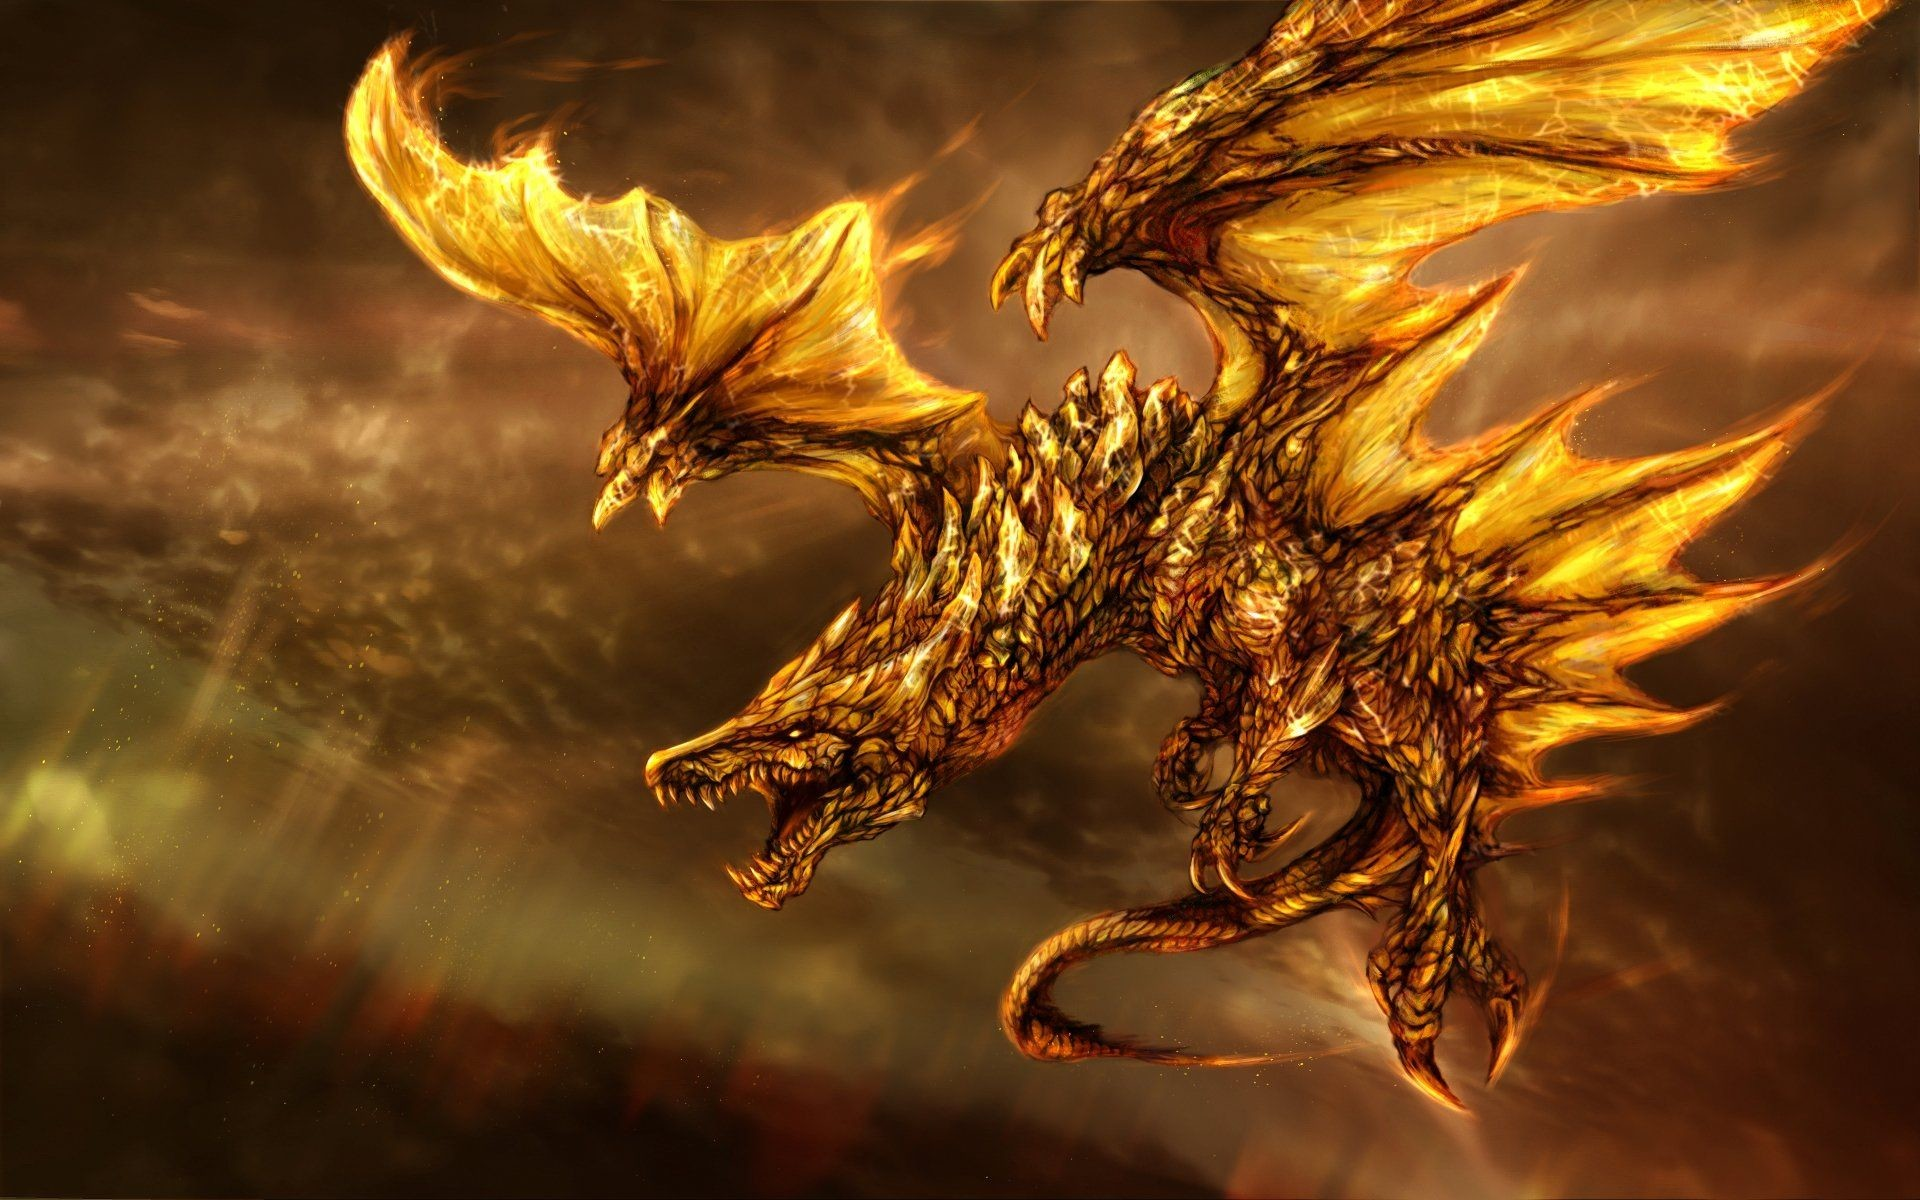 Free Dragon Screensavers And Wallpapers – Wallpaper Cave